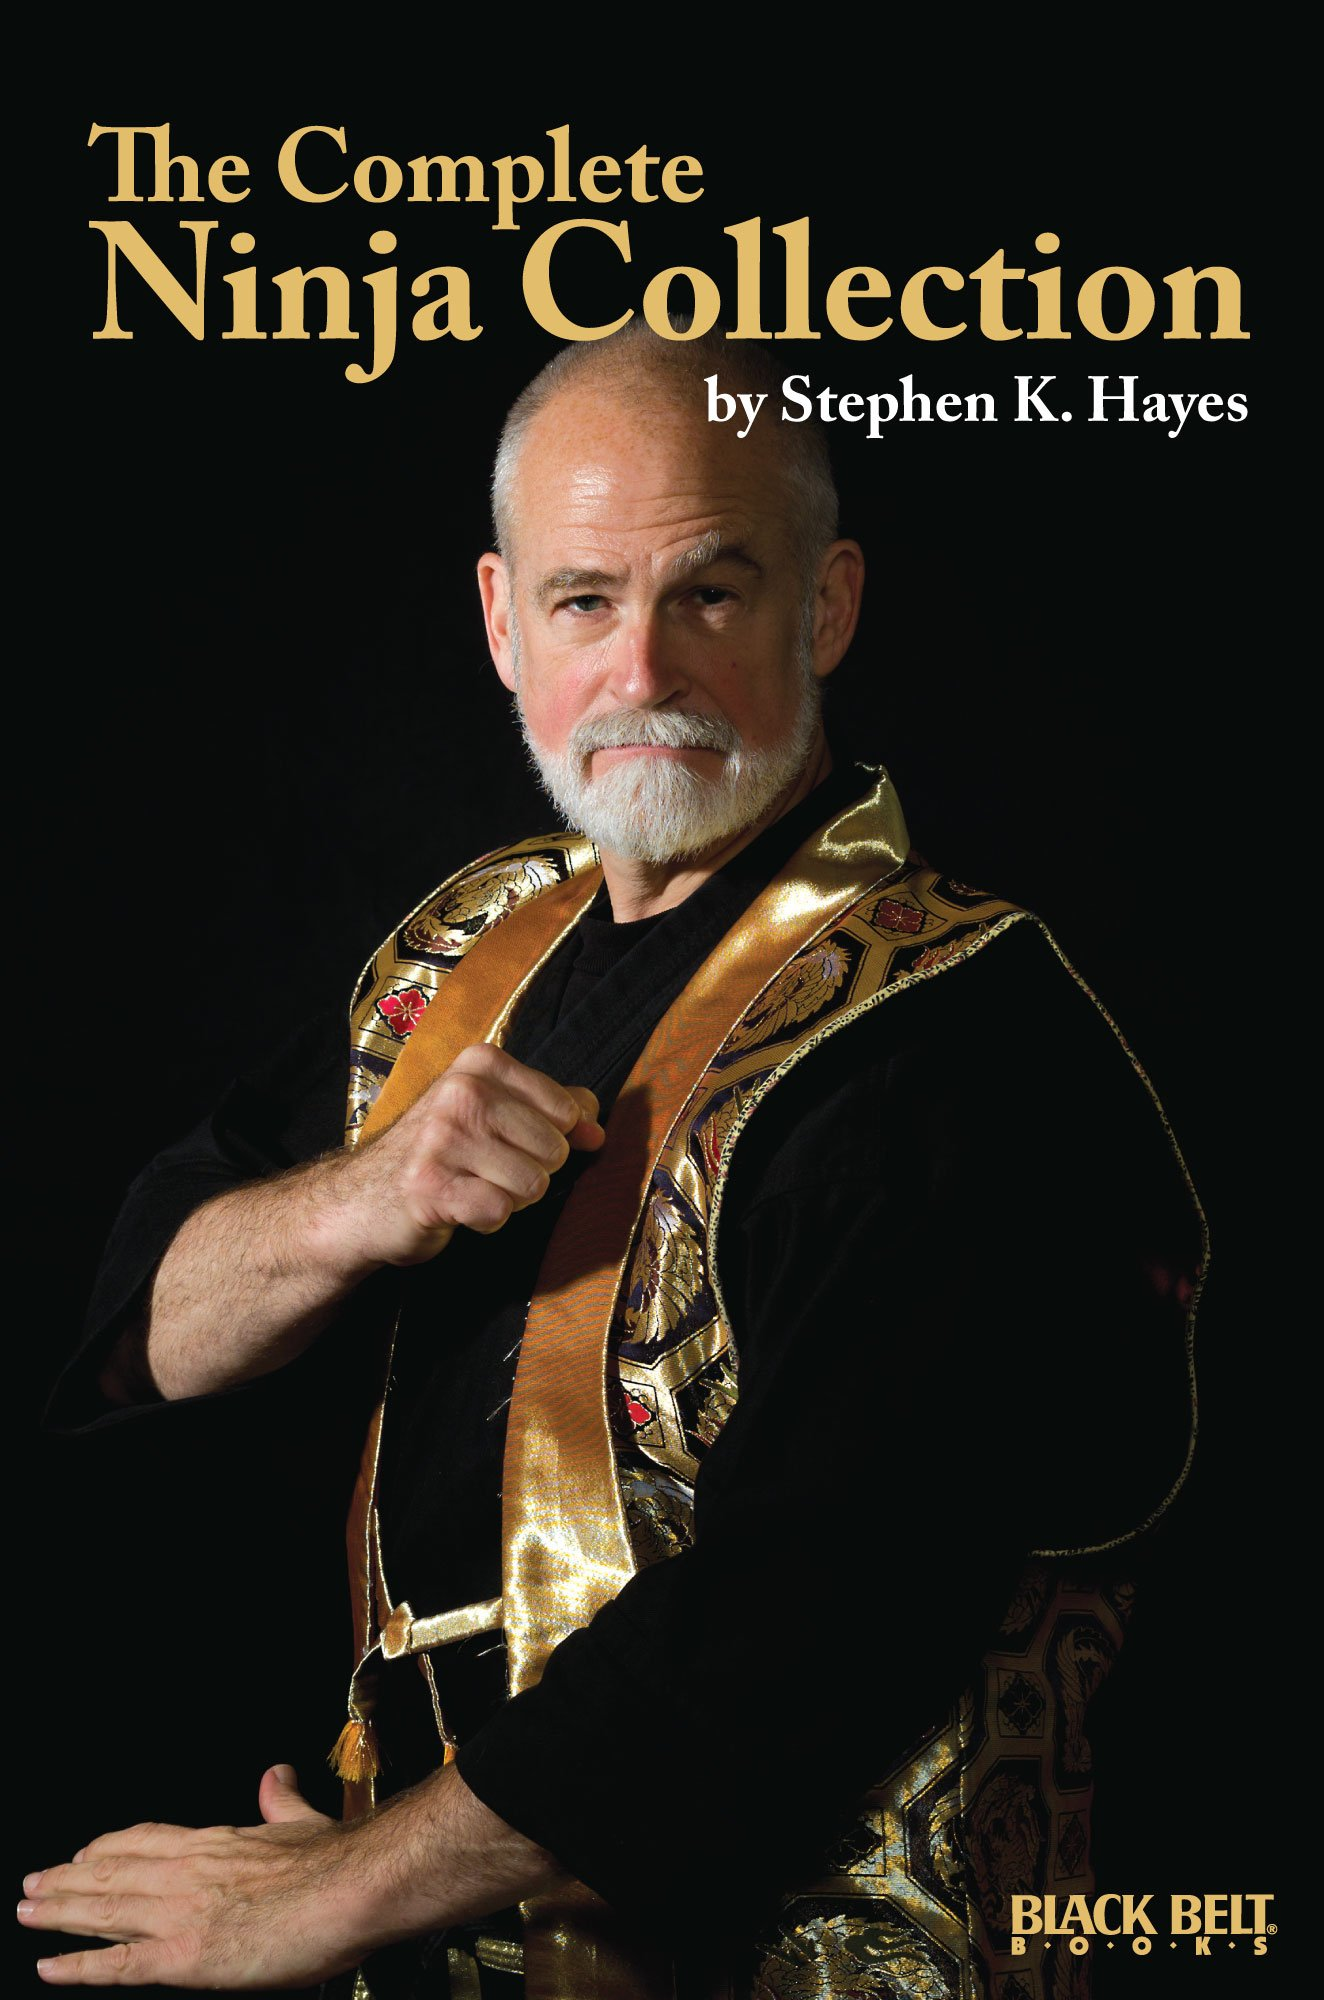 The Complete Ninja Collection: Amazon.es: Stephen K. Hayes ...